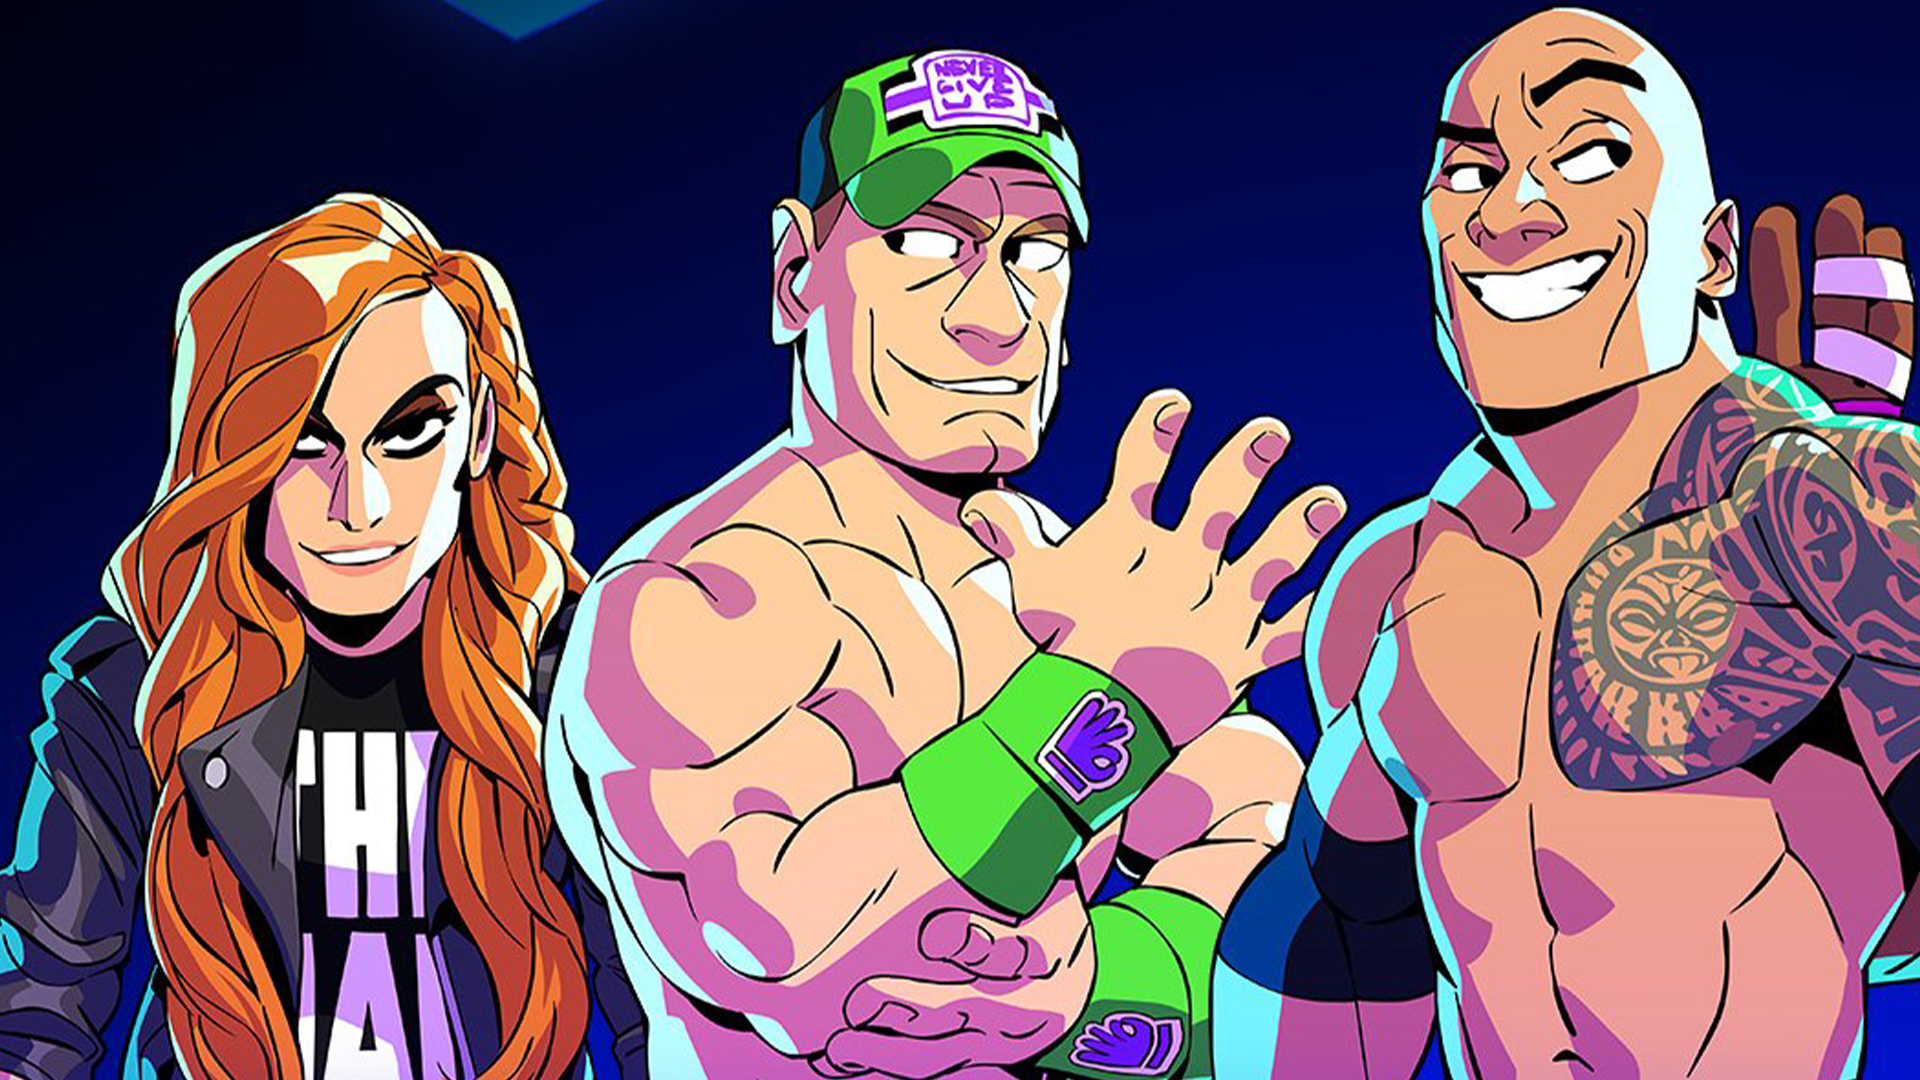 John Cena Becky Lynch And More Wwe Stars Join Smash Bros Like Brawlhalla Pcgamesn